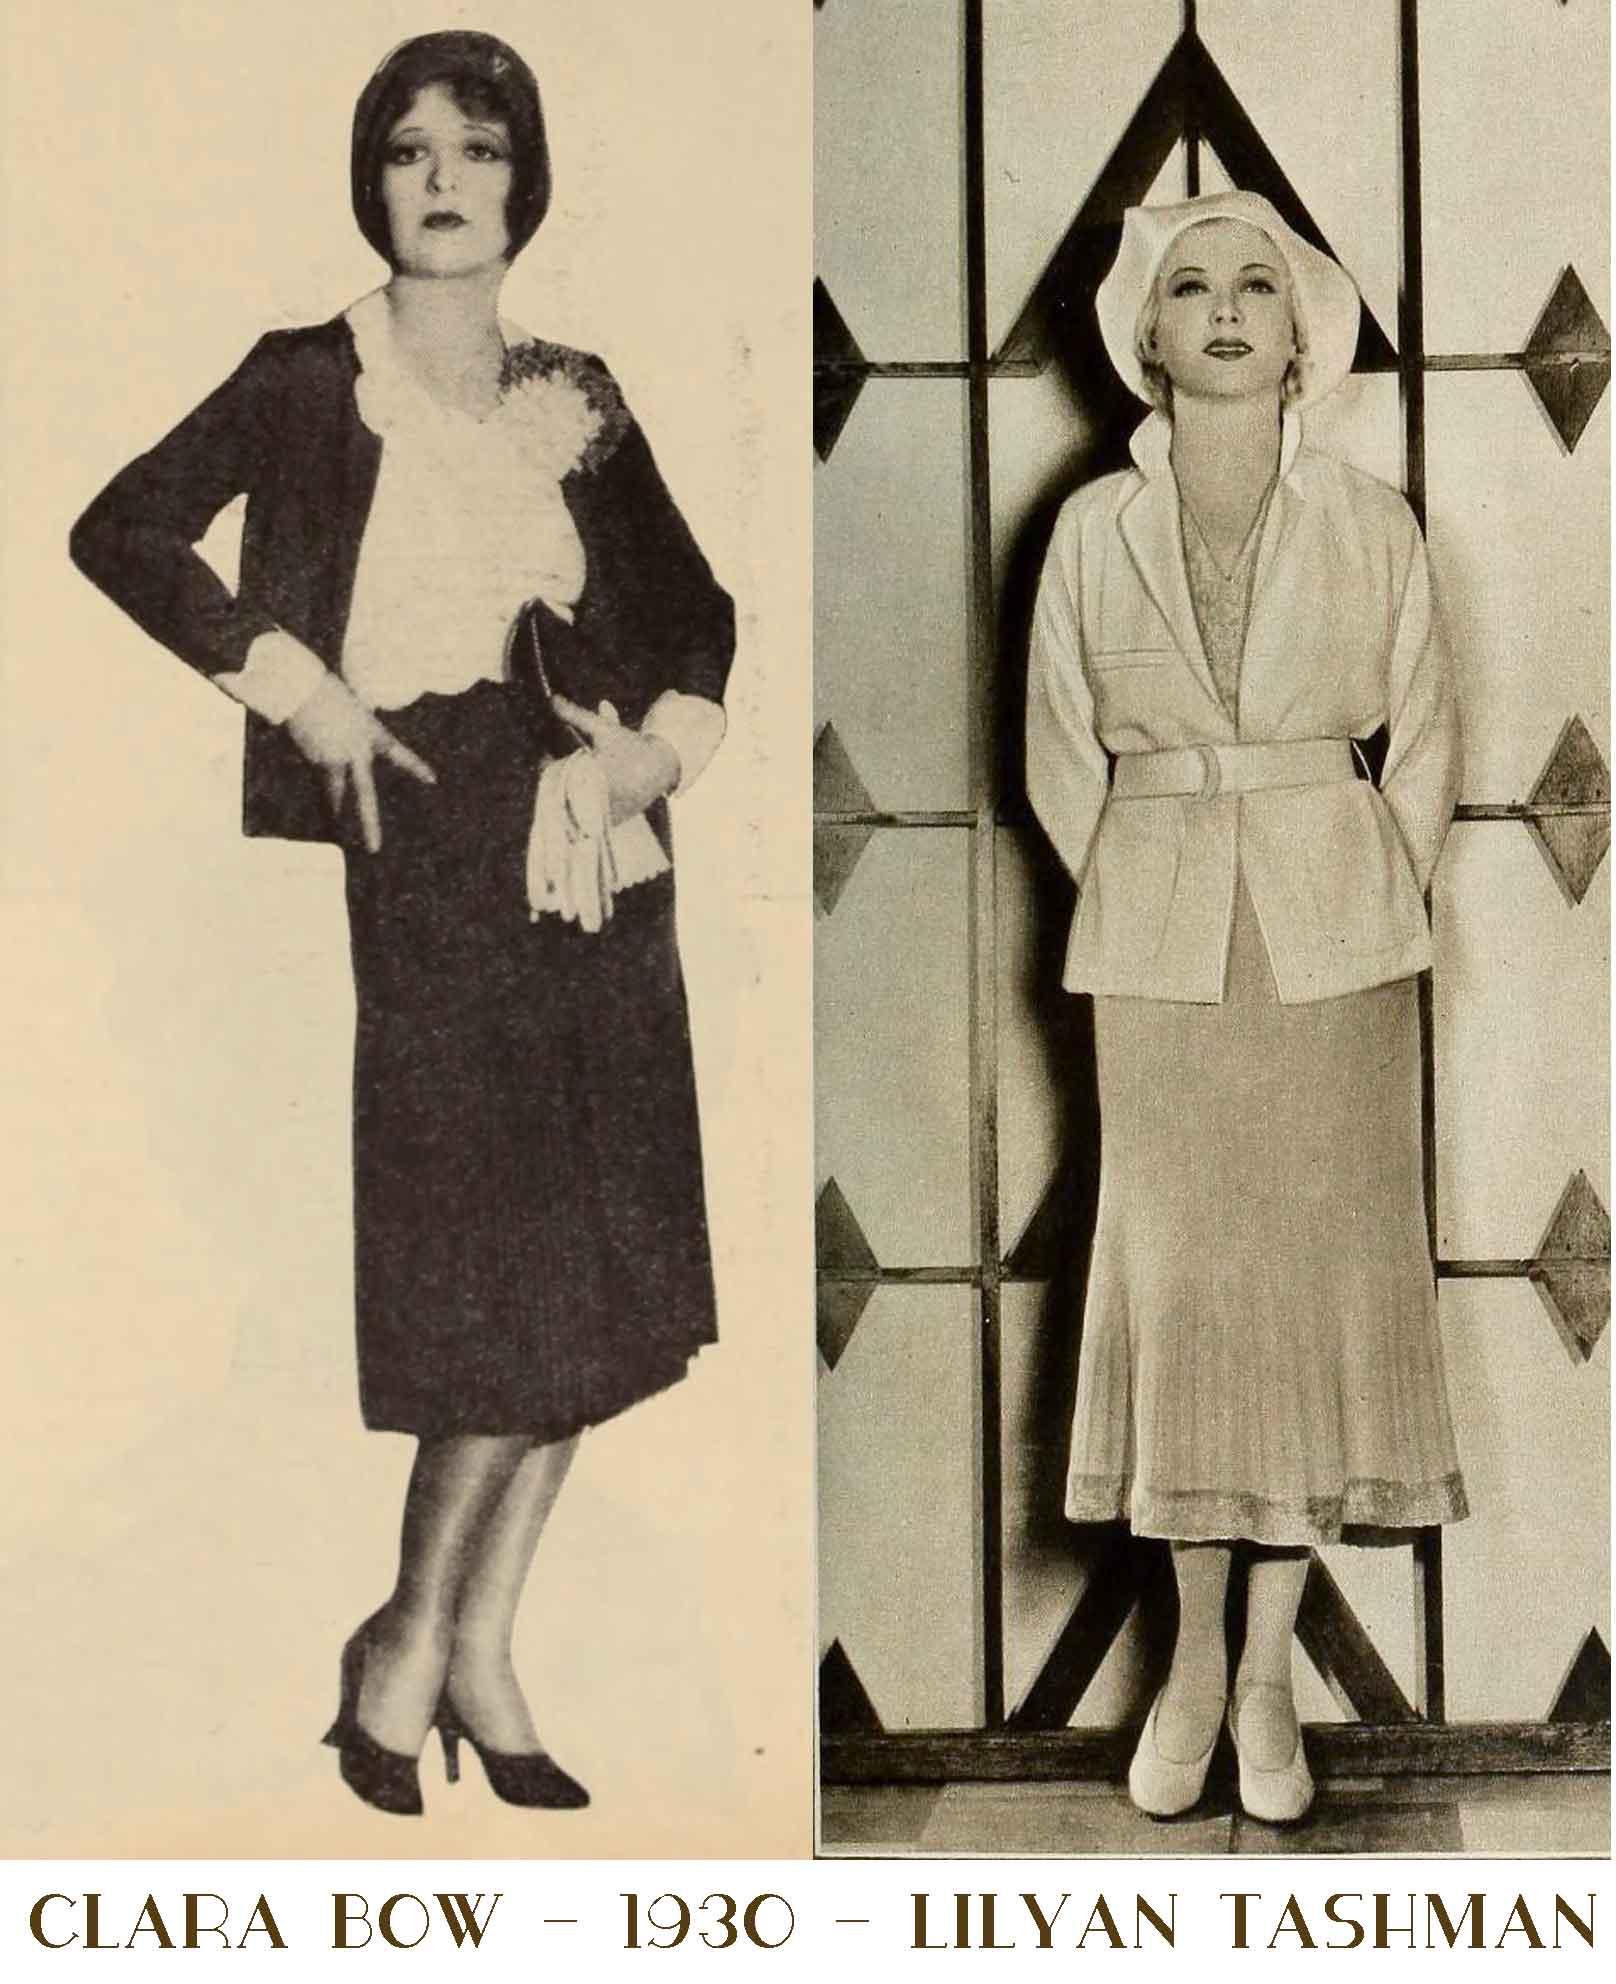 1930s Photos Wedding Fashion History - Haute Couture 1930 s fashion photos